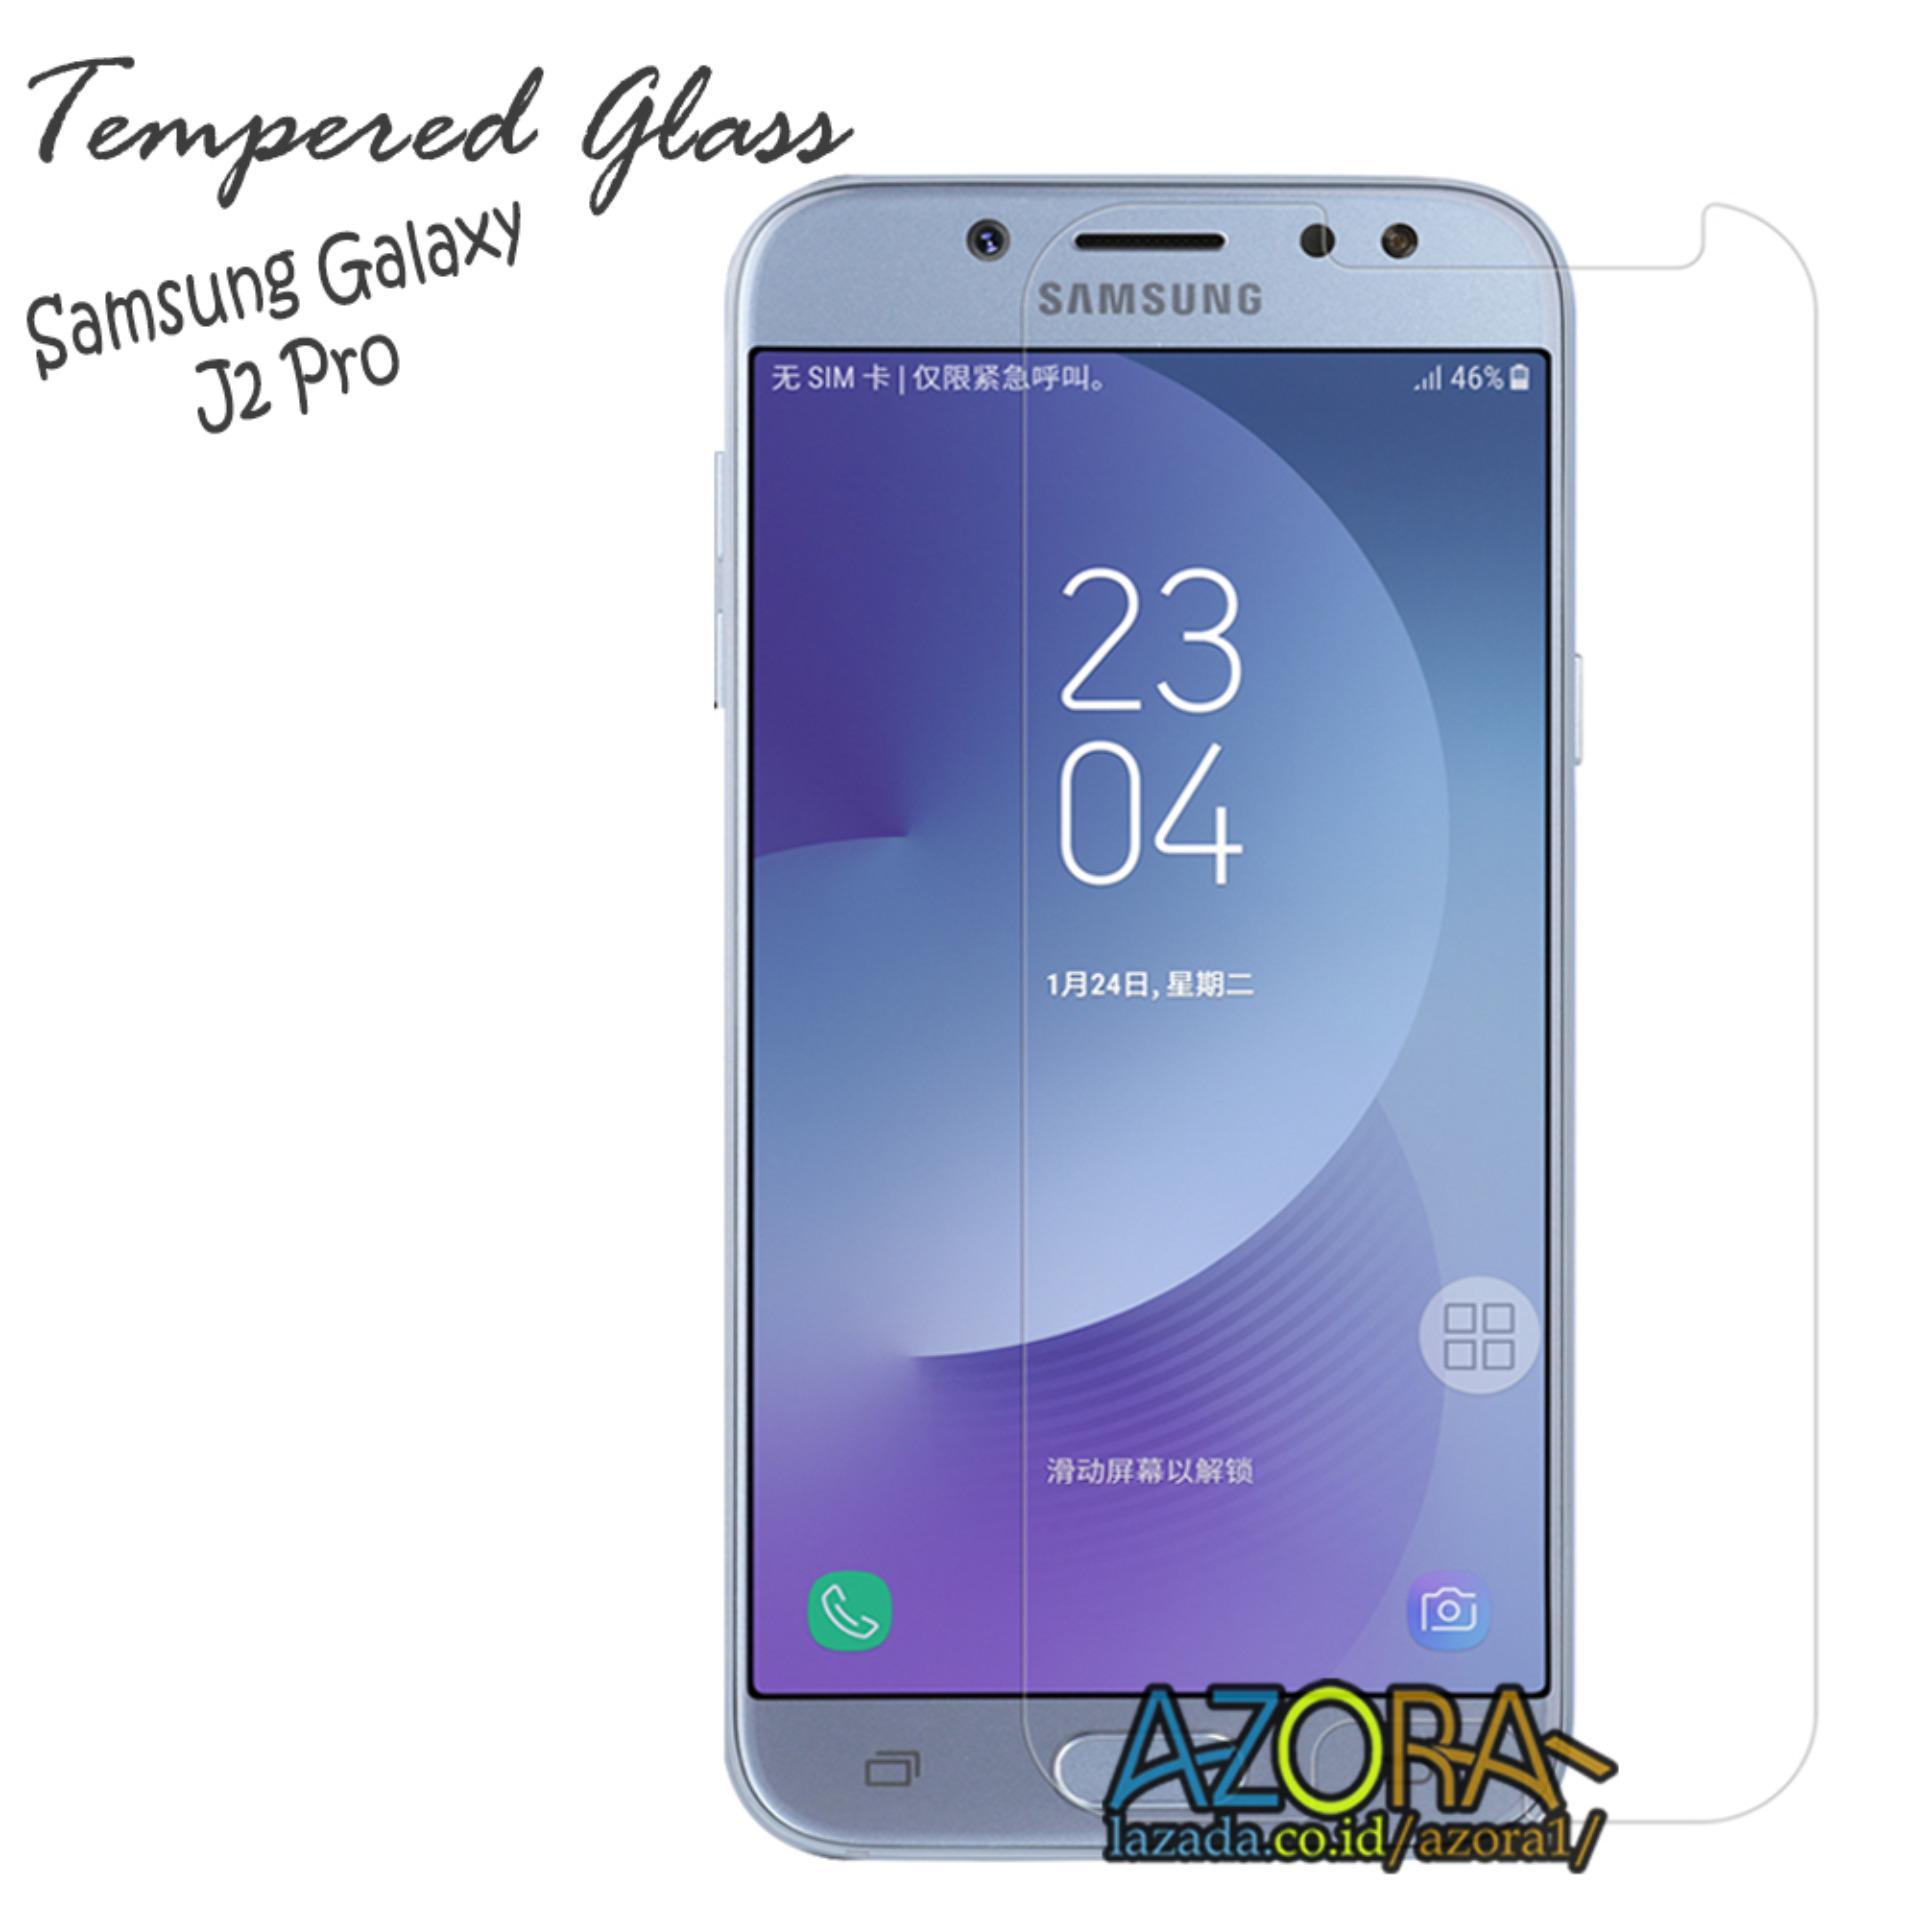 Cek Harga Baru Tempered Glass Screen Protector Anti Gores Kaca Temperred Samsung Galaxy J2 Pro Pelindung Layar Bening